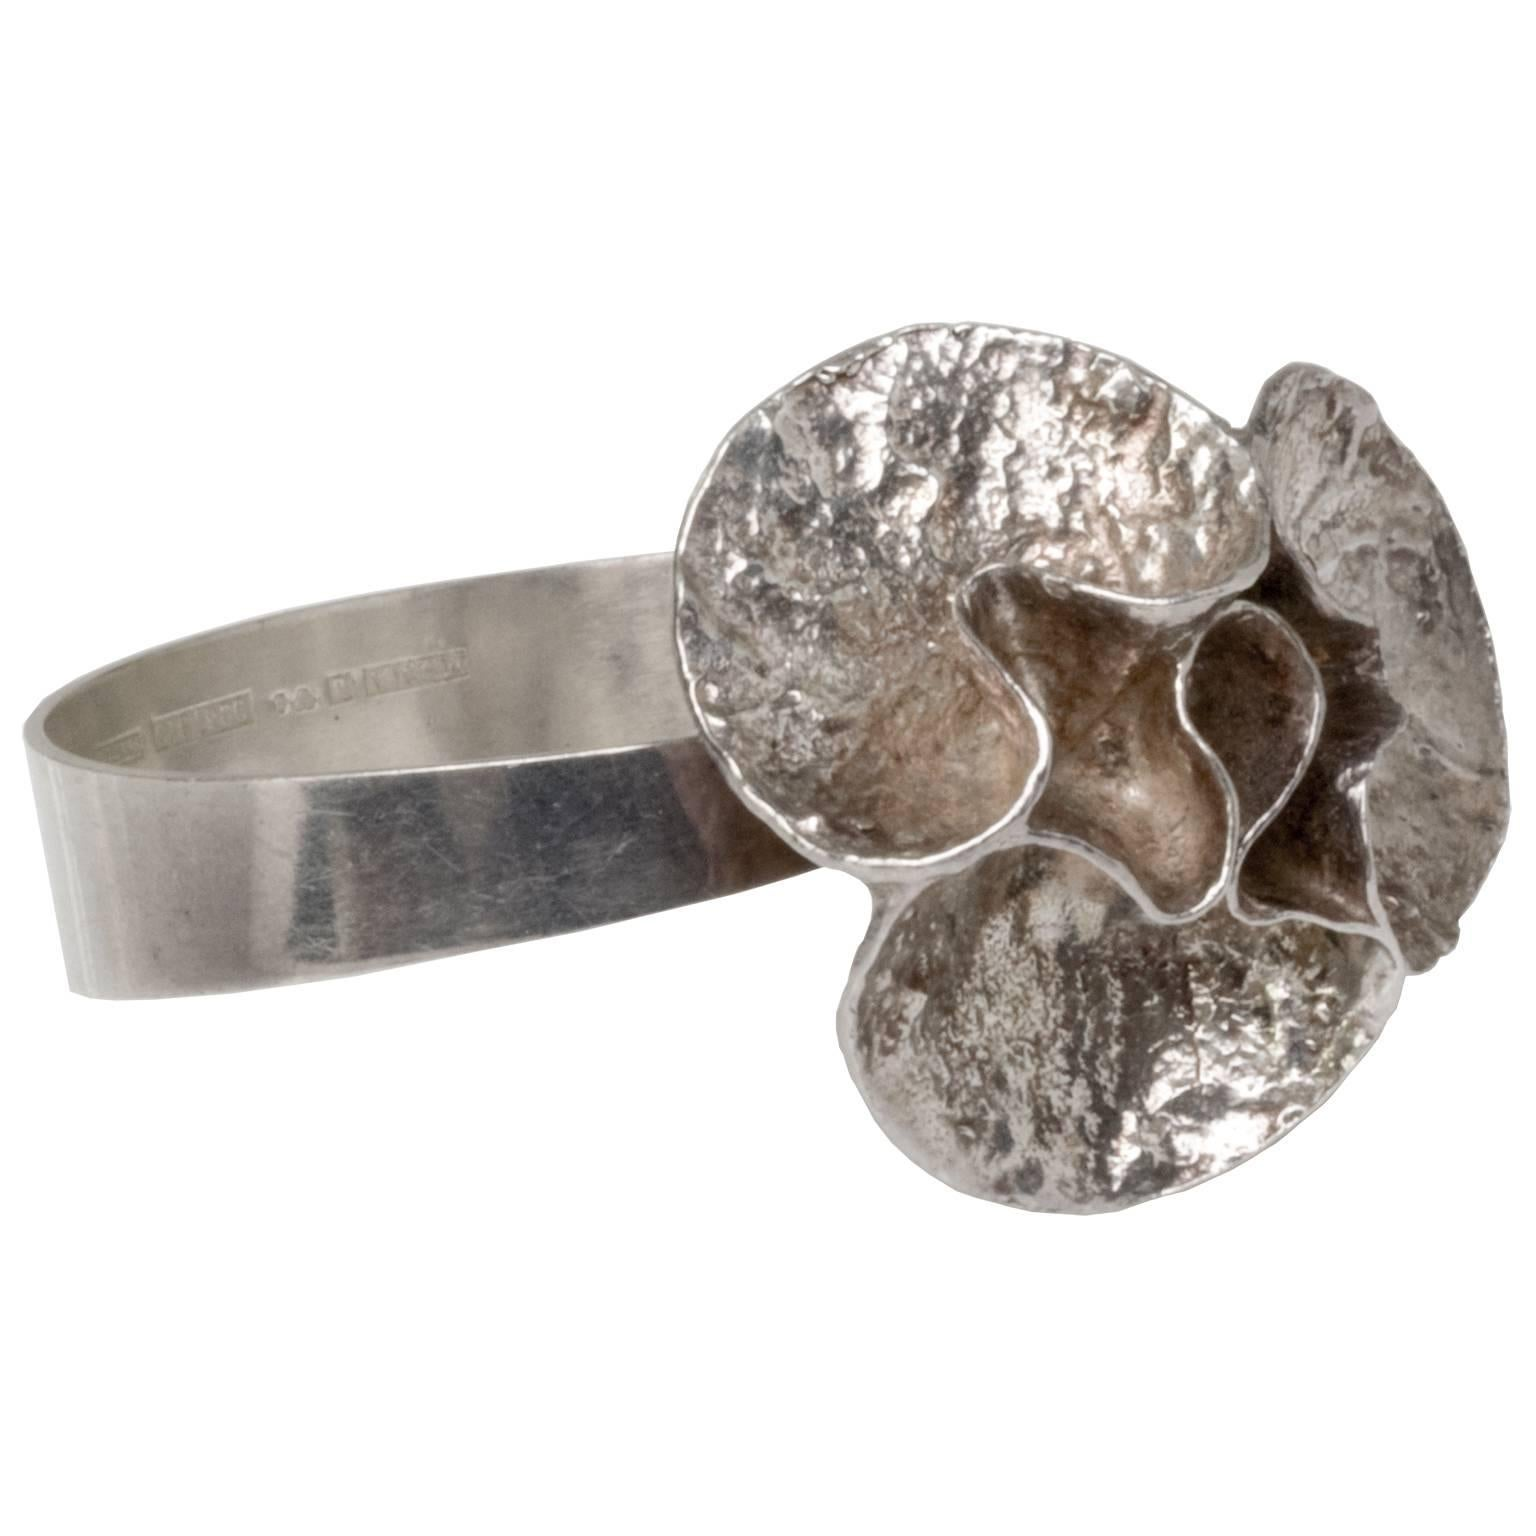 Scandinavian Modern Silver Bracelet by Theresia Hvorslev, Sweden